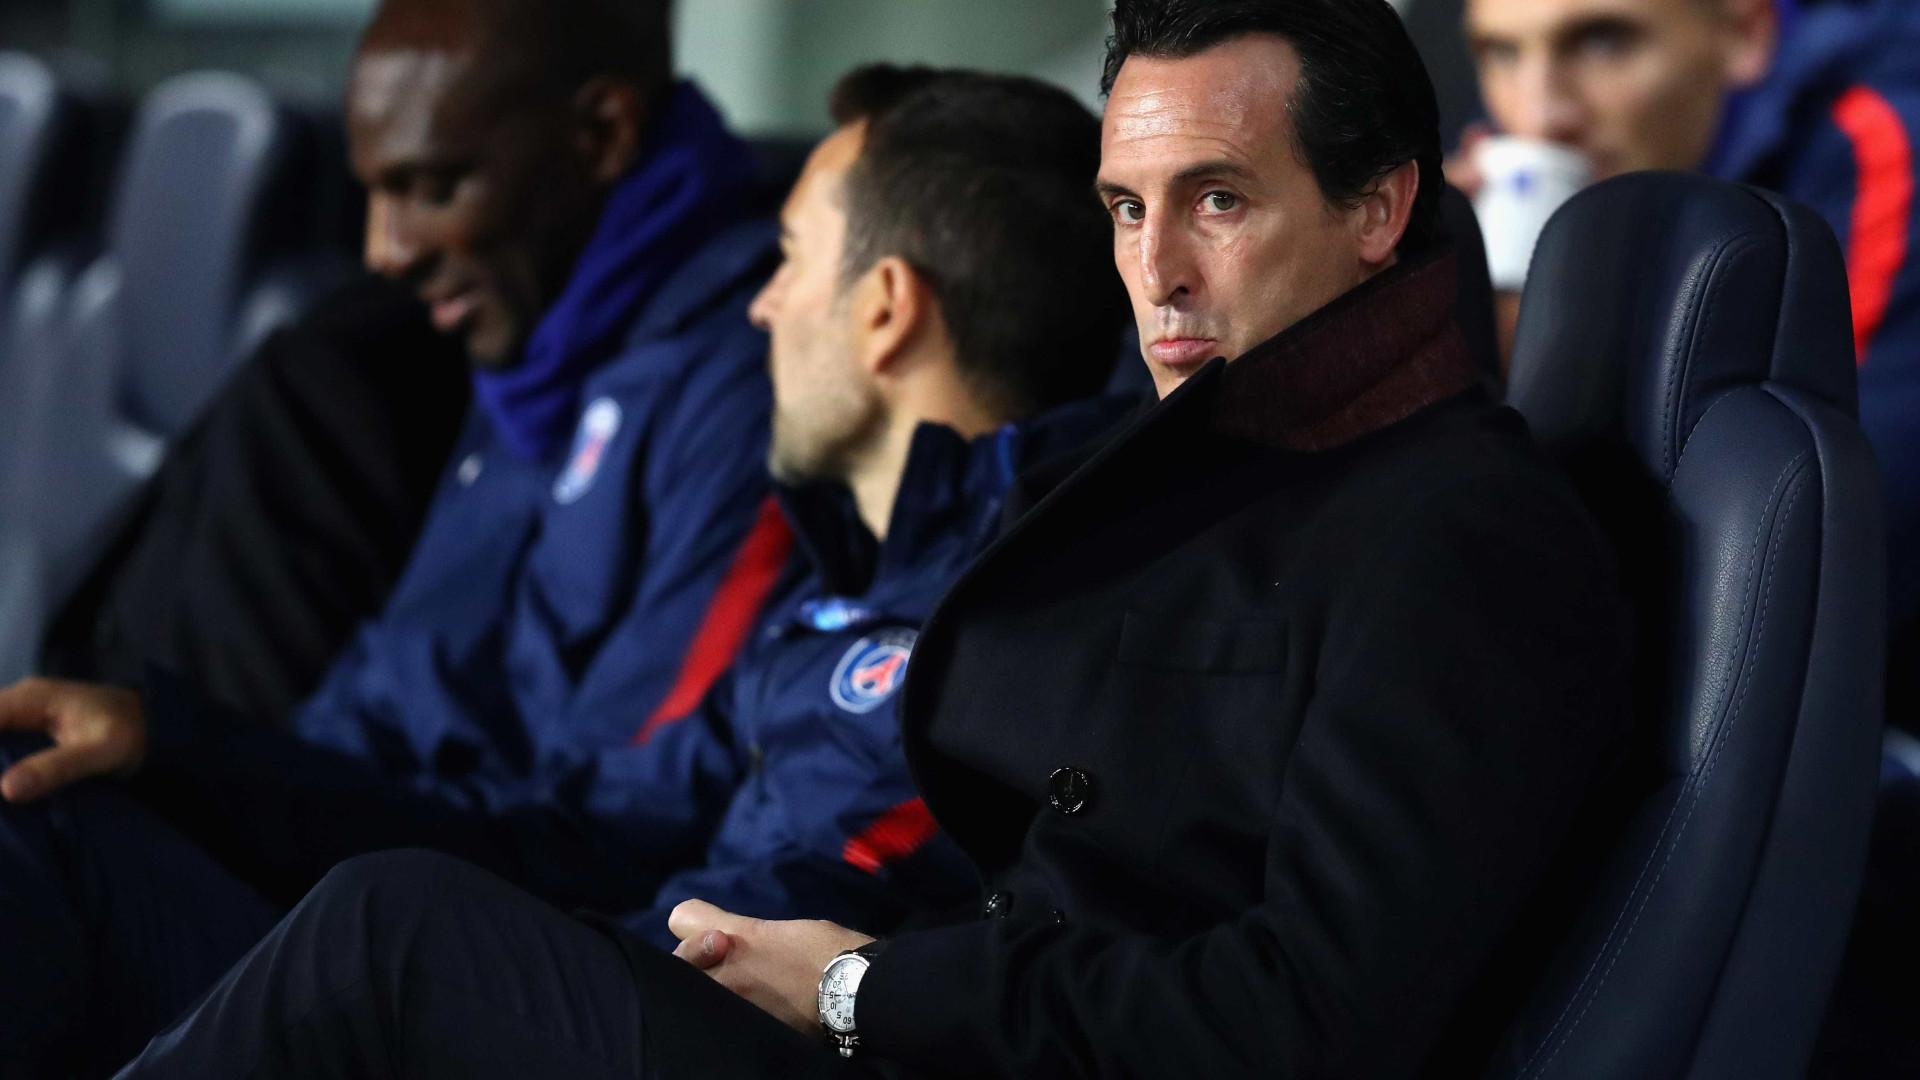 Paris Saint-Germain estuda substituos para o técnico Unai Emery